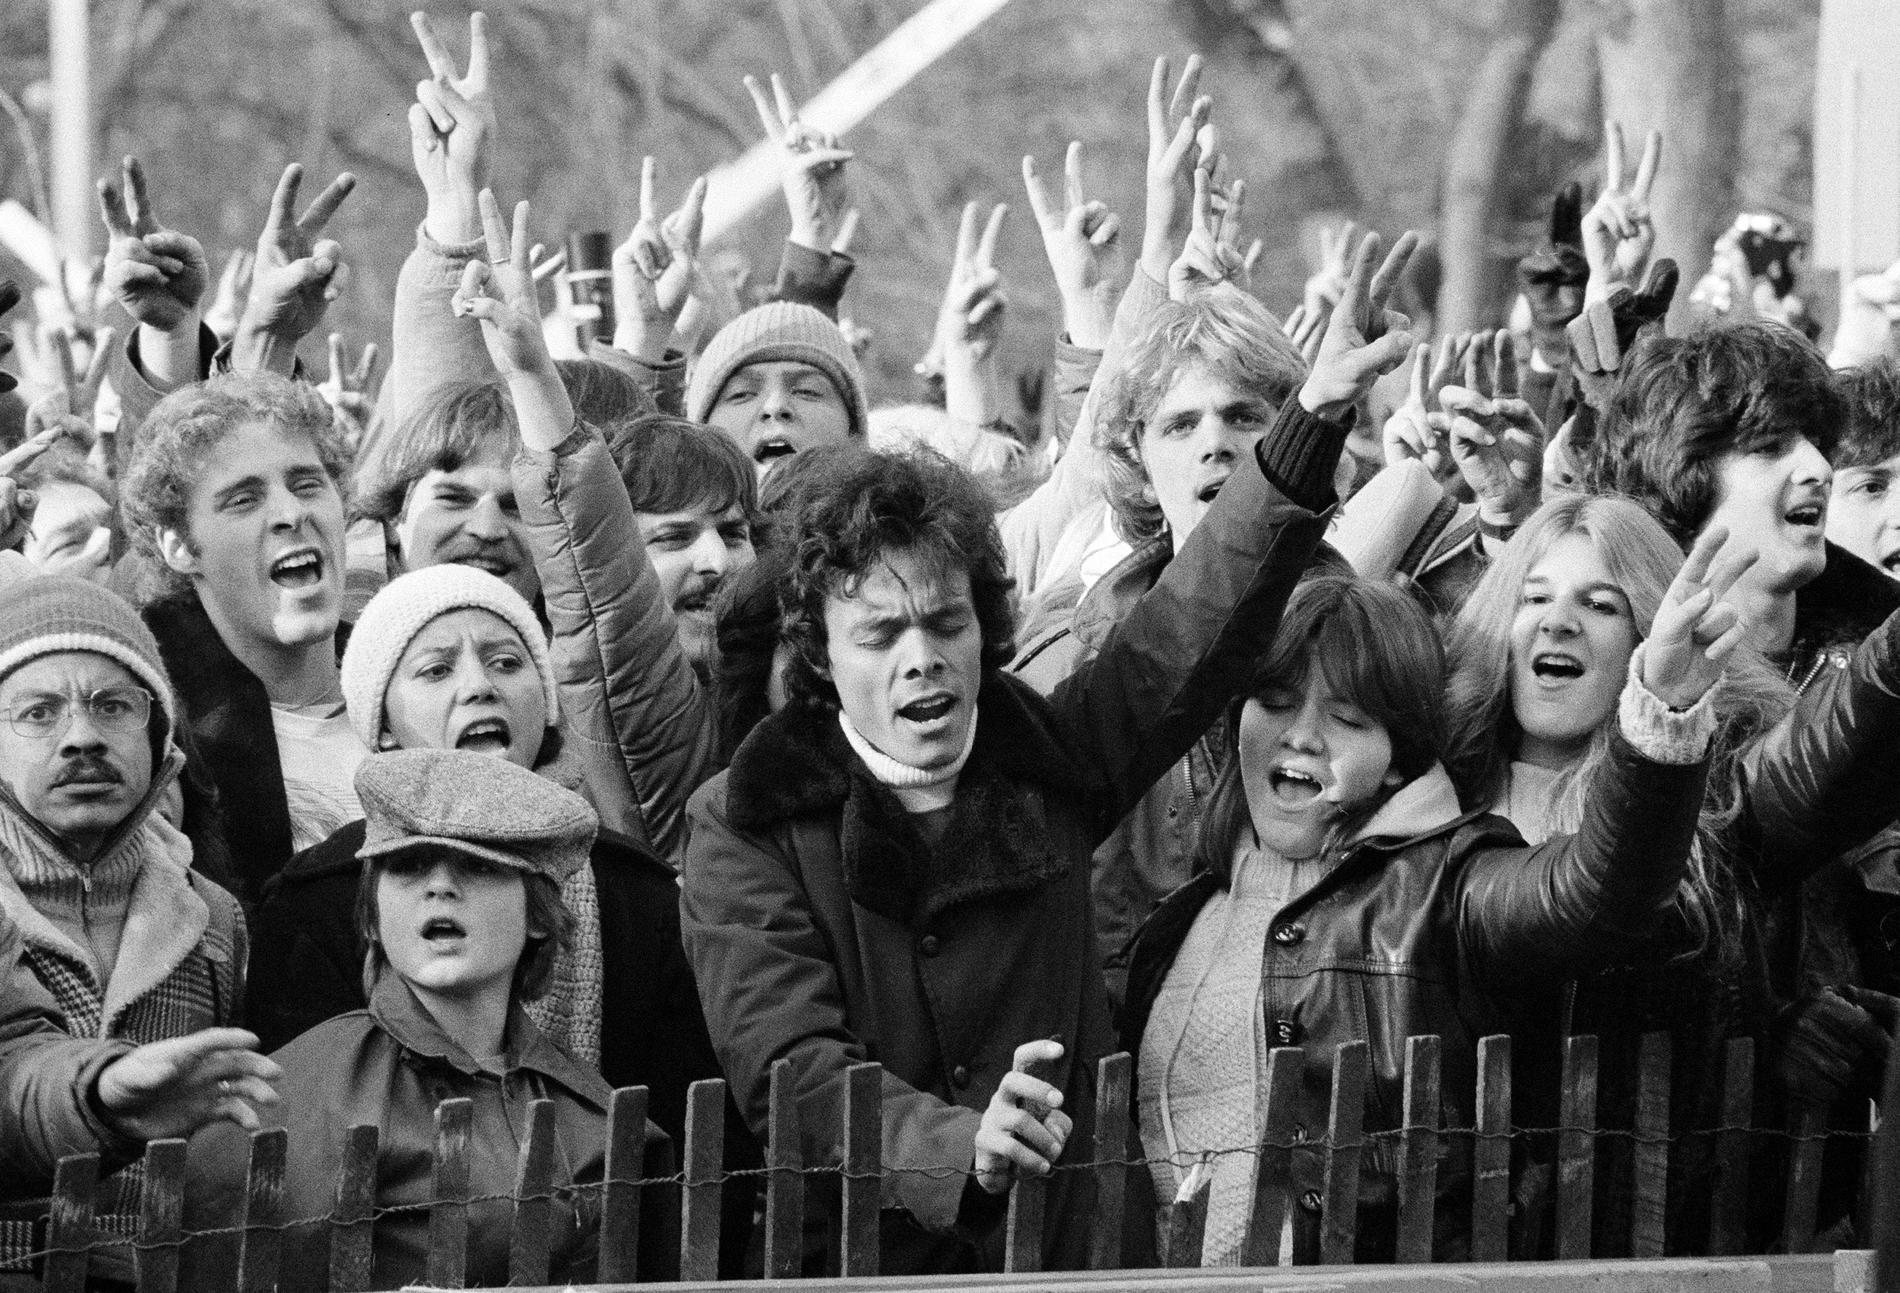 "Efter John Lennons död samlades 100 000 besökare i Central park och sjöng ""Give peace a chance""."